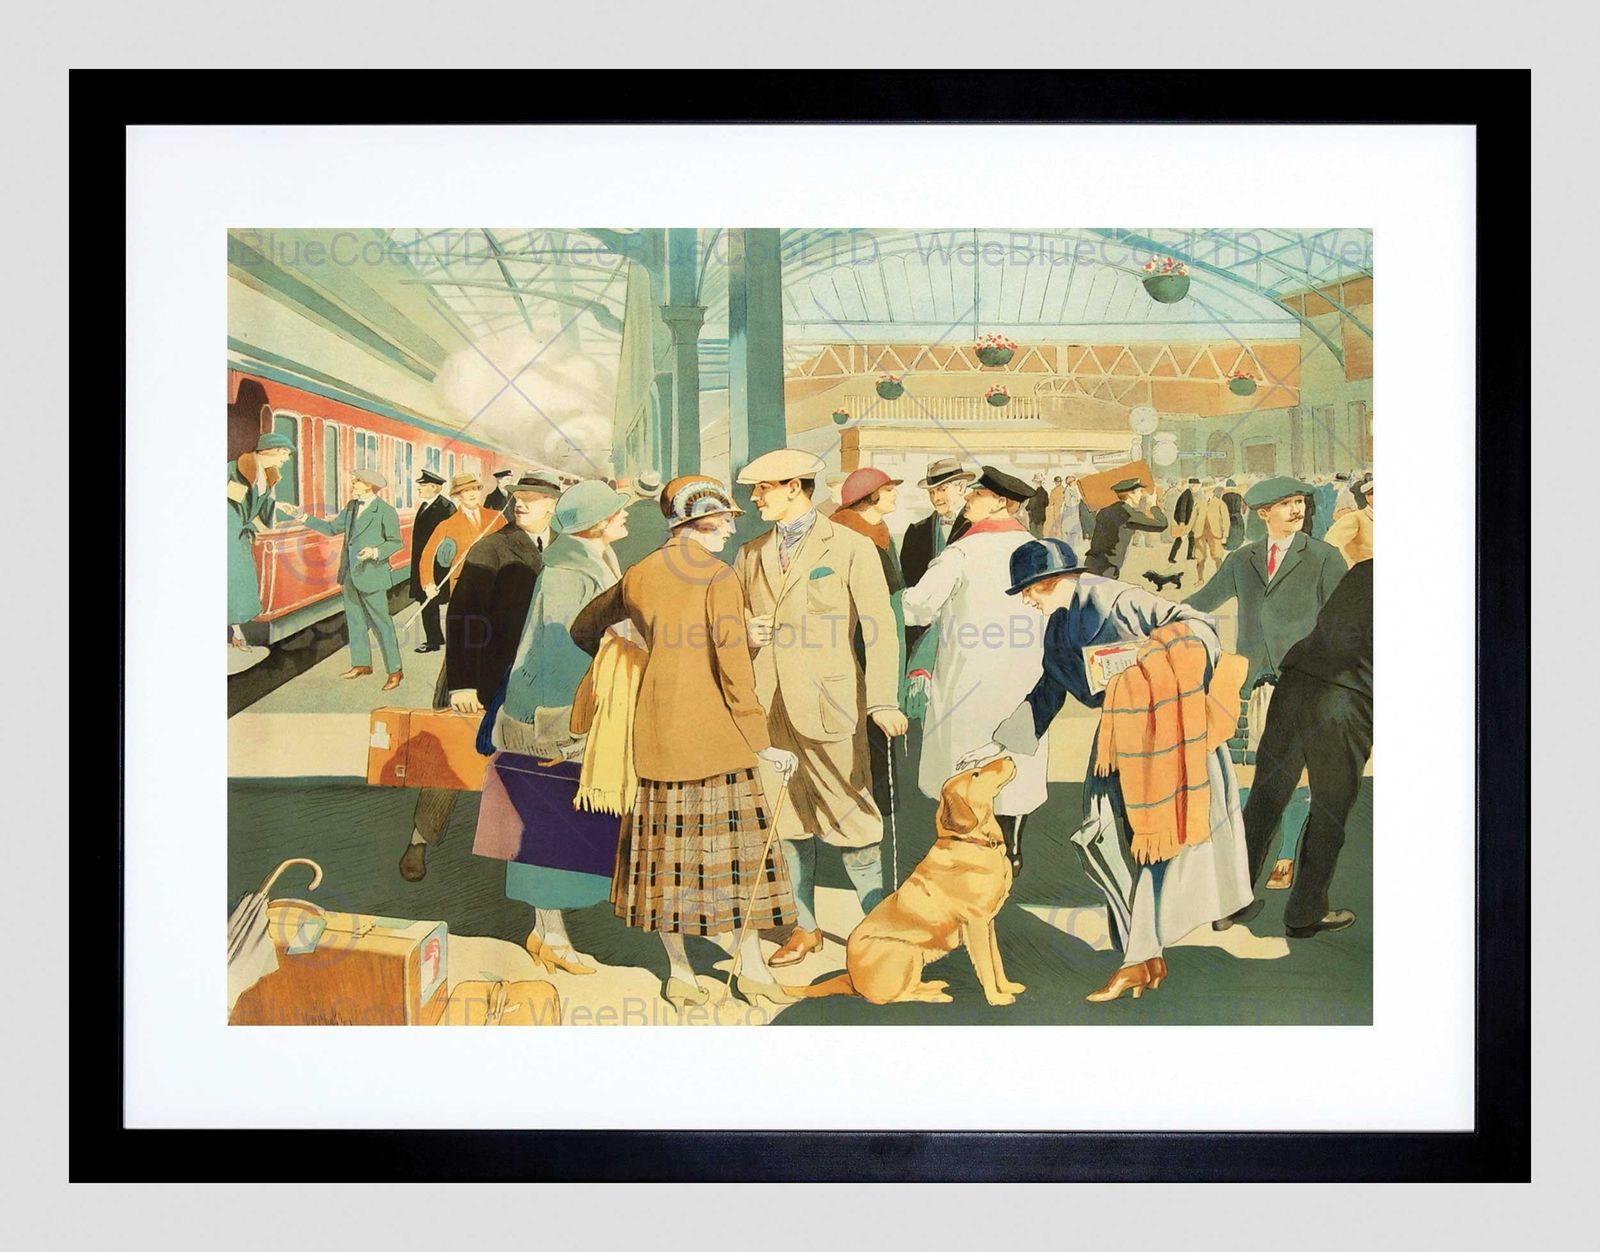 85714 PERTH RAIL STATION TRAIN SCOTLAND BRITAIN Decor WALL PRINT ...